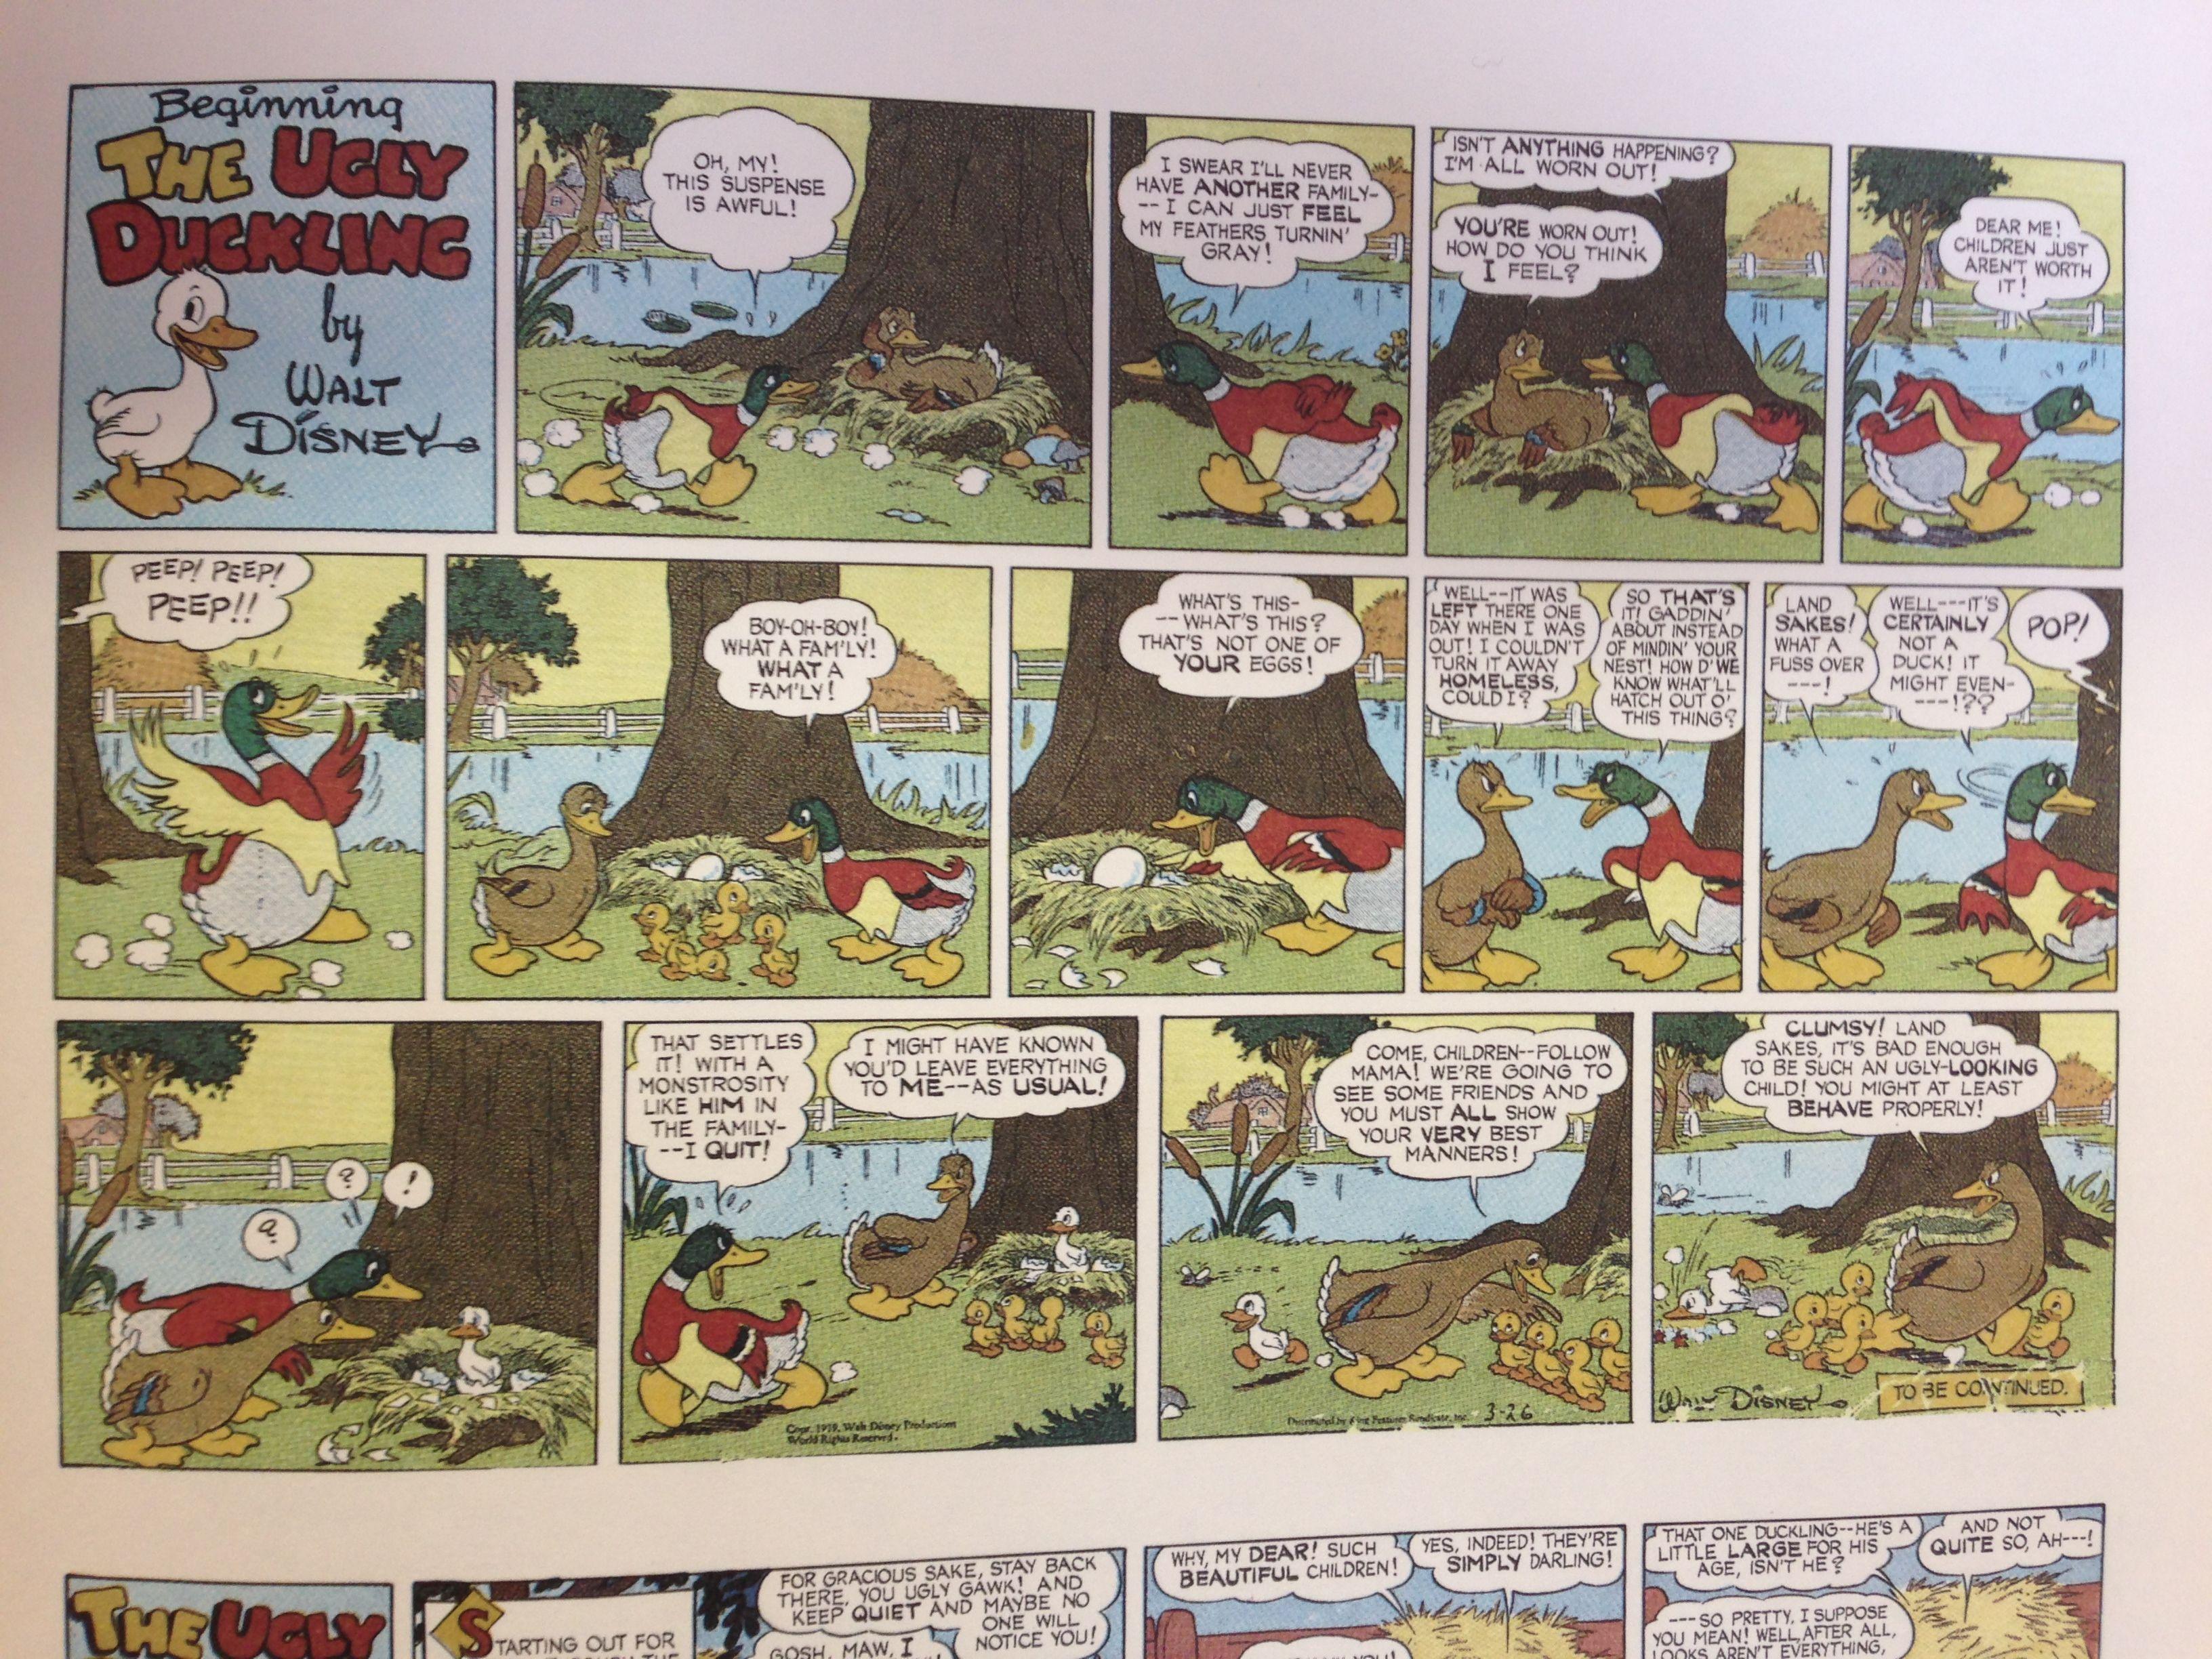 disney ugly duckling comic honk directing capstone pinterest